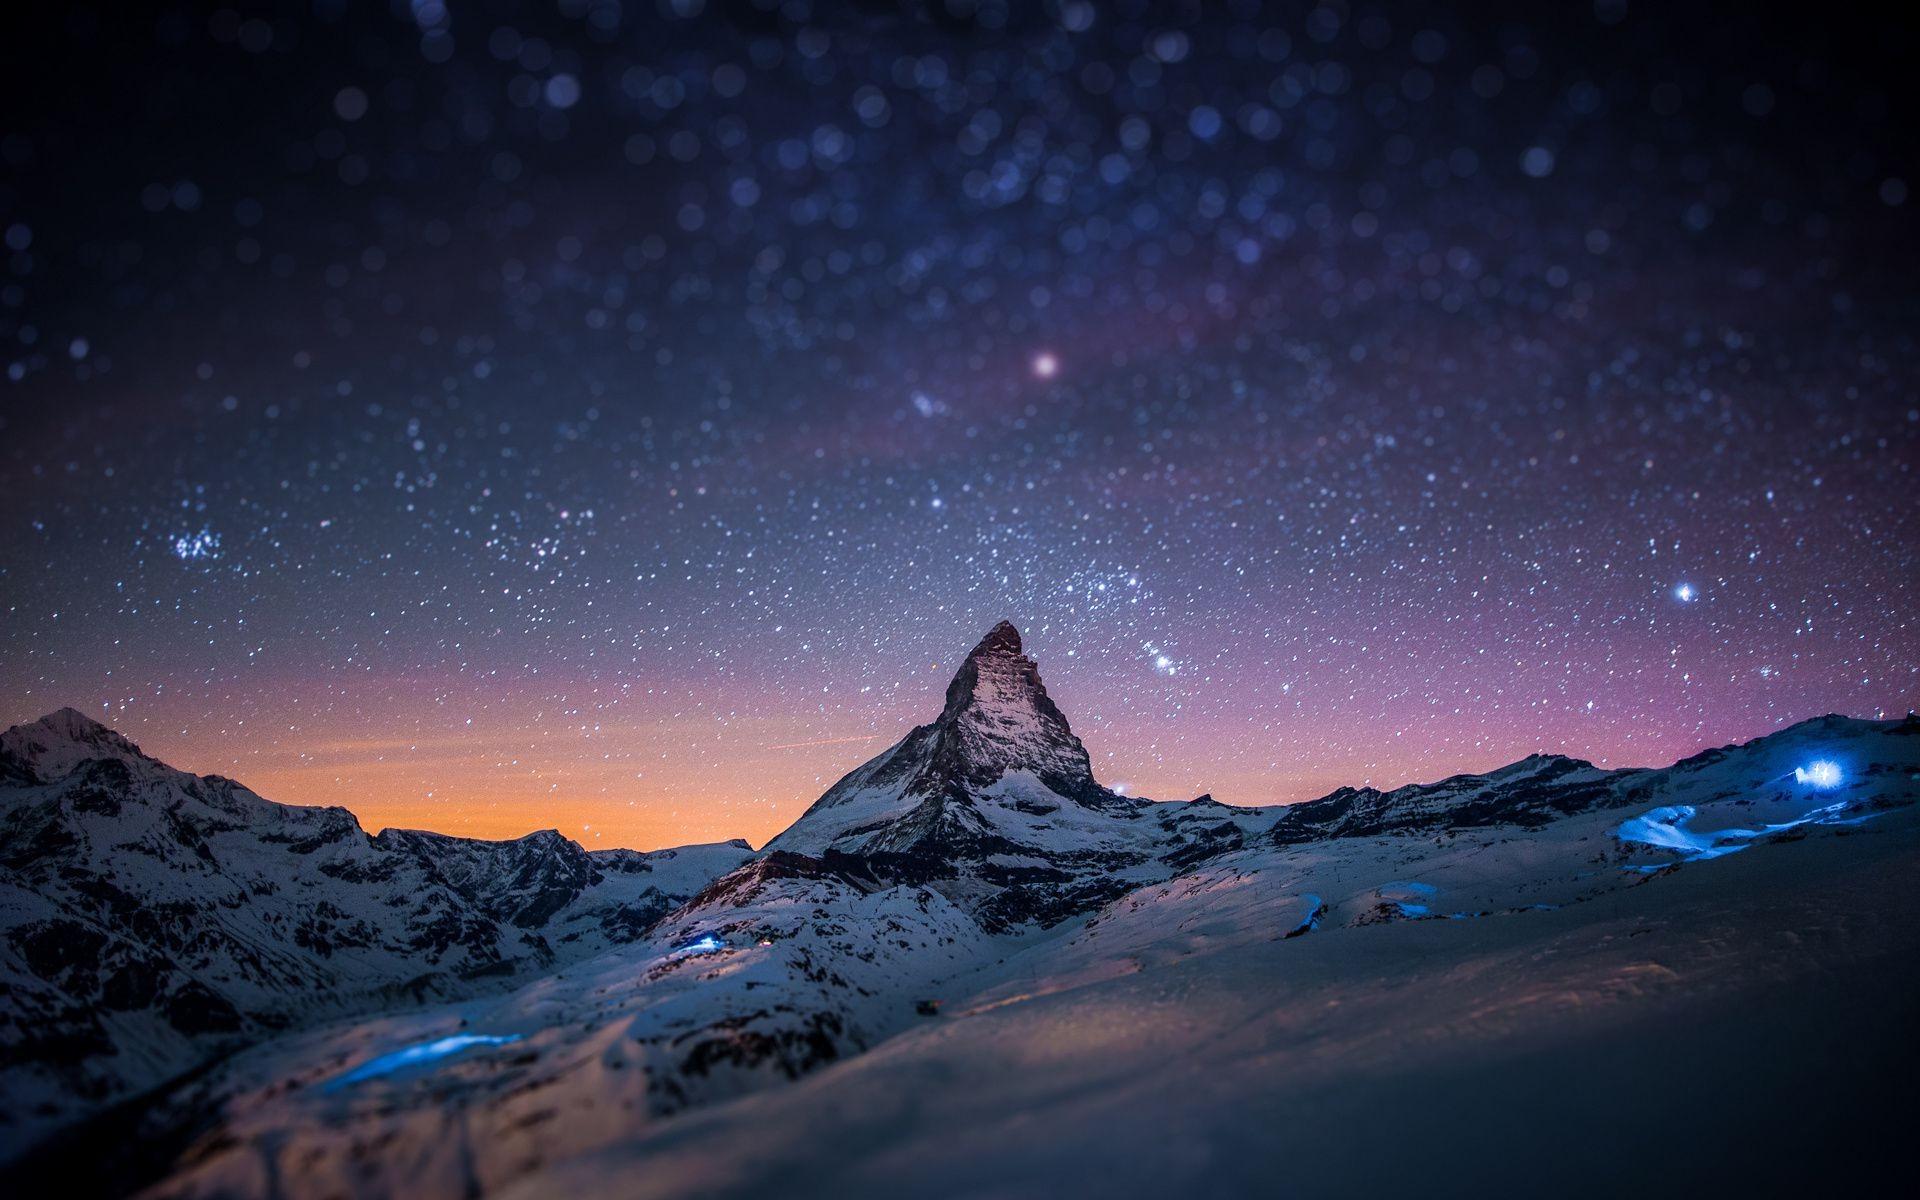 Обои горы арарат  раздел Природа размер 2560x1600 Wide